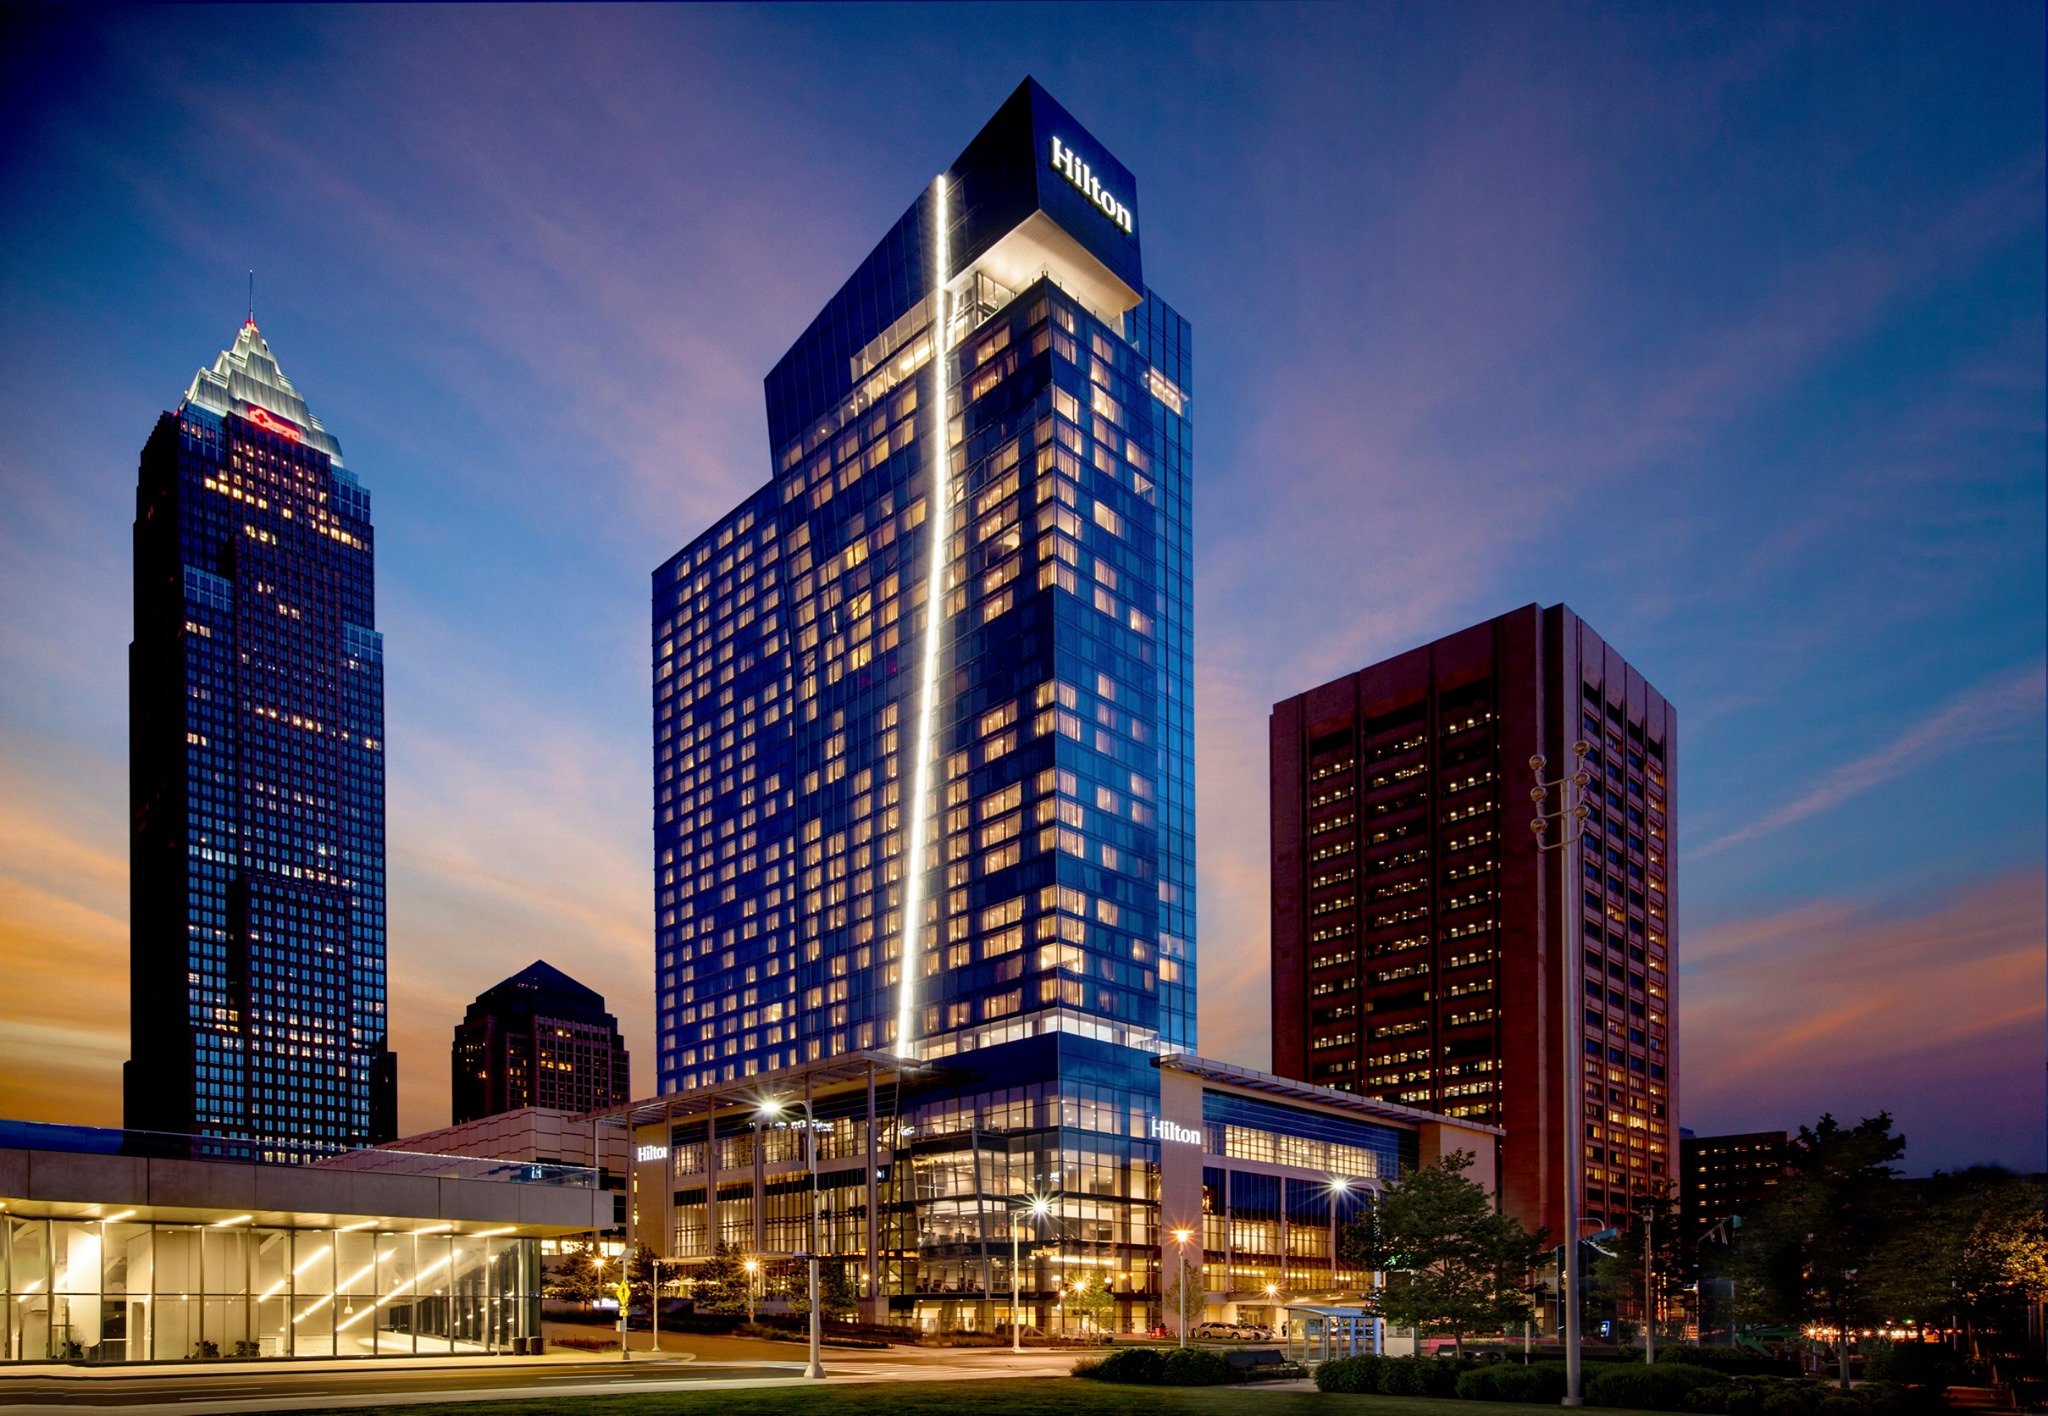 Hilton Downtown Cleveland Hotel